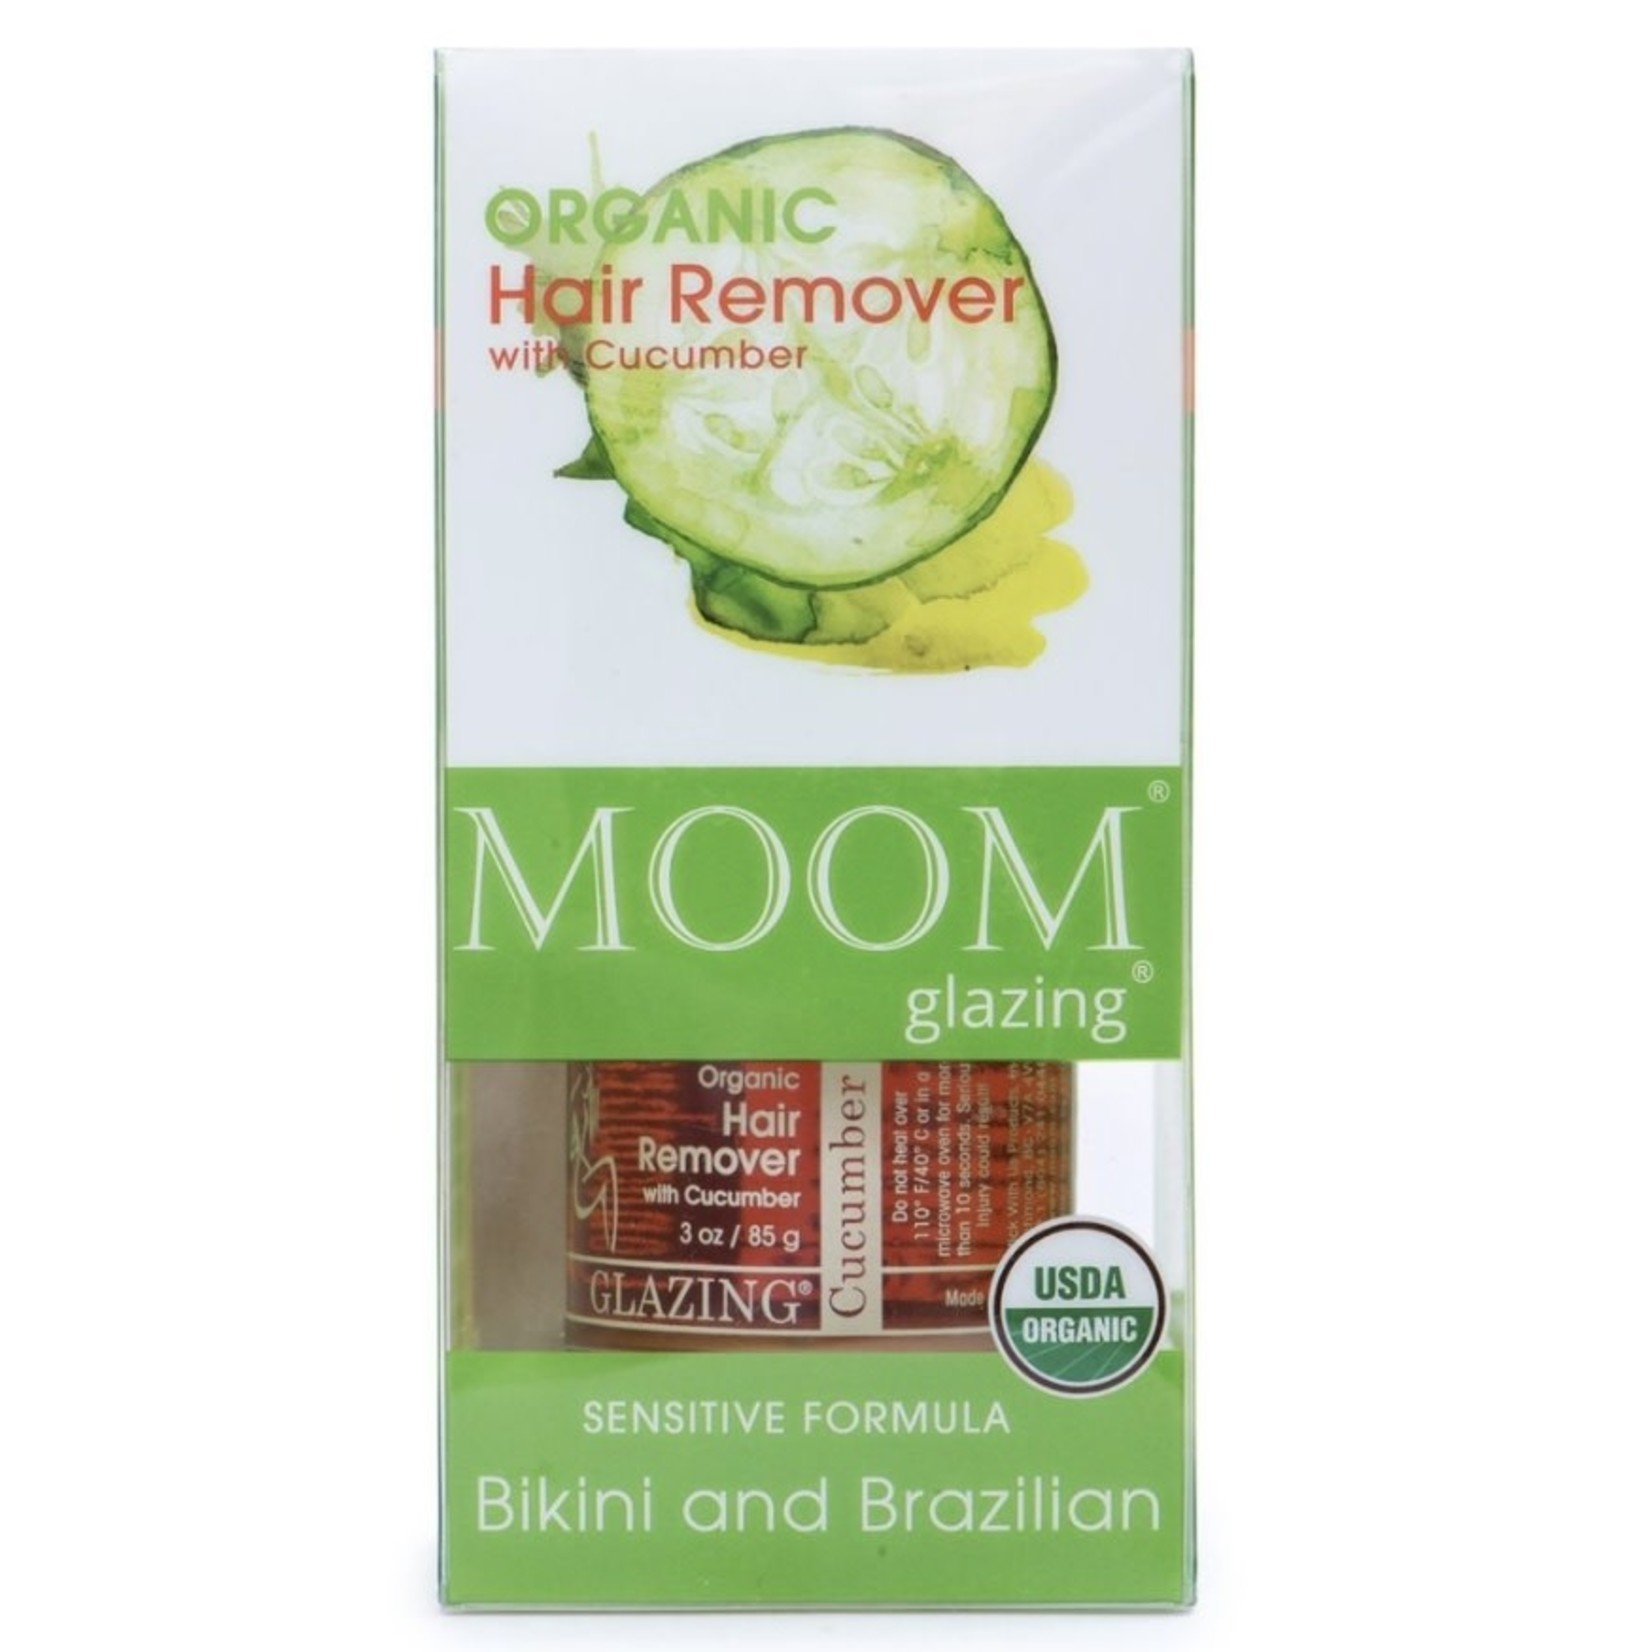 Moom Moom Bikini and Brazilian Hair Remover with Cucumber